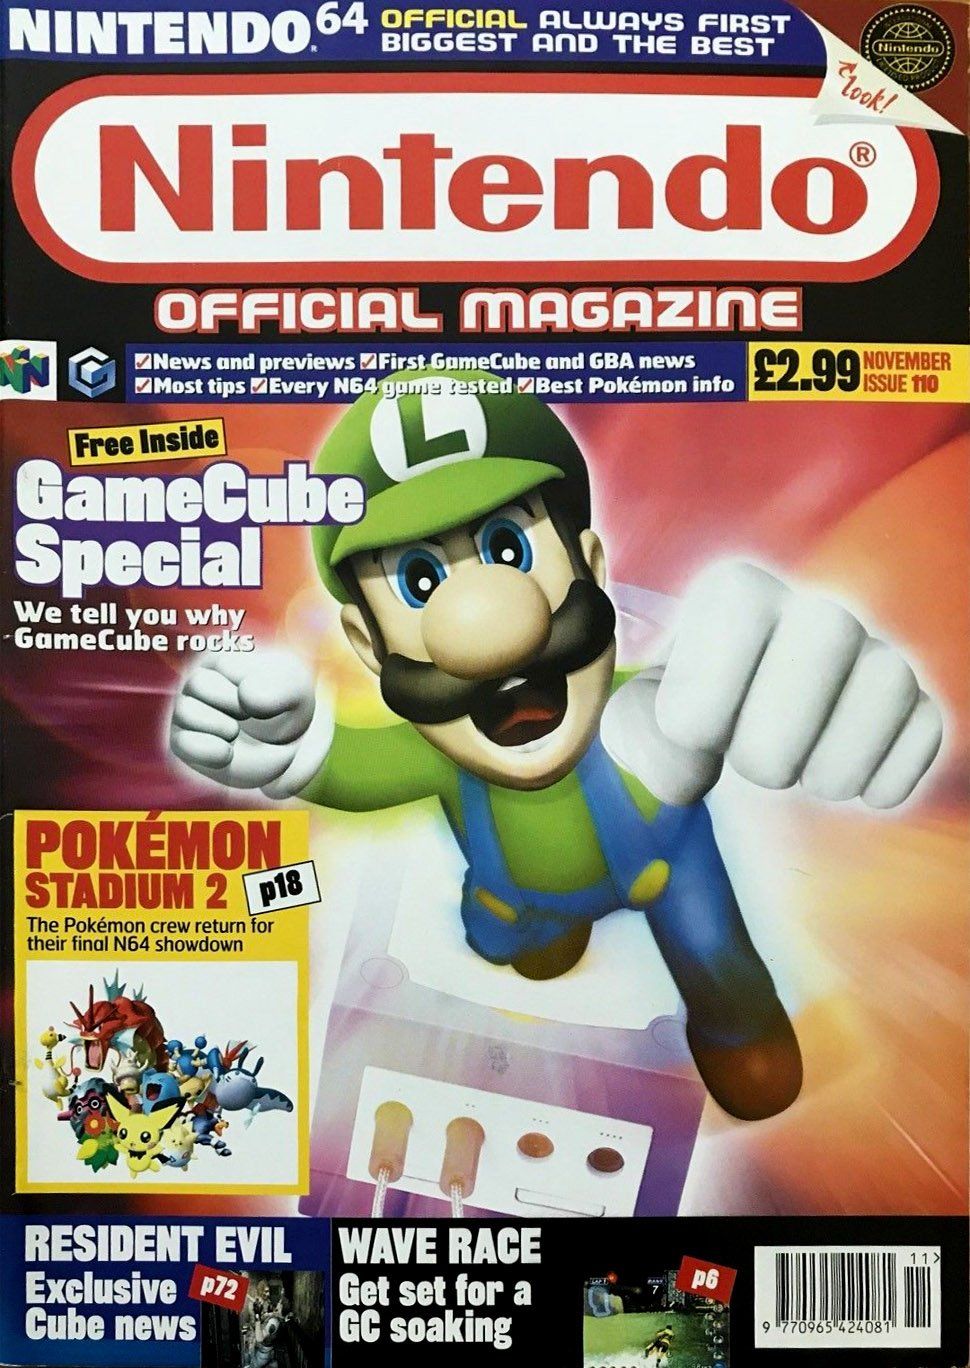 Nintendo Official Magazine 110 (November 2001)